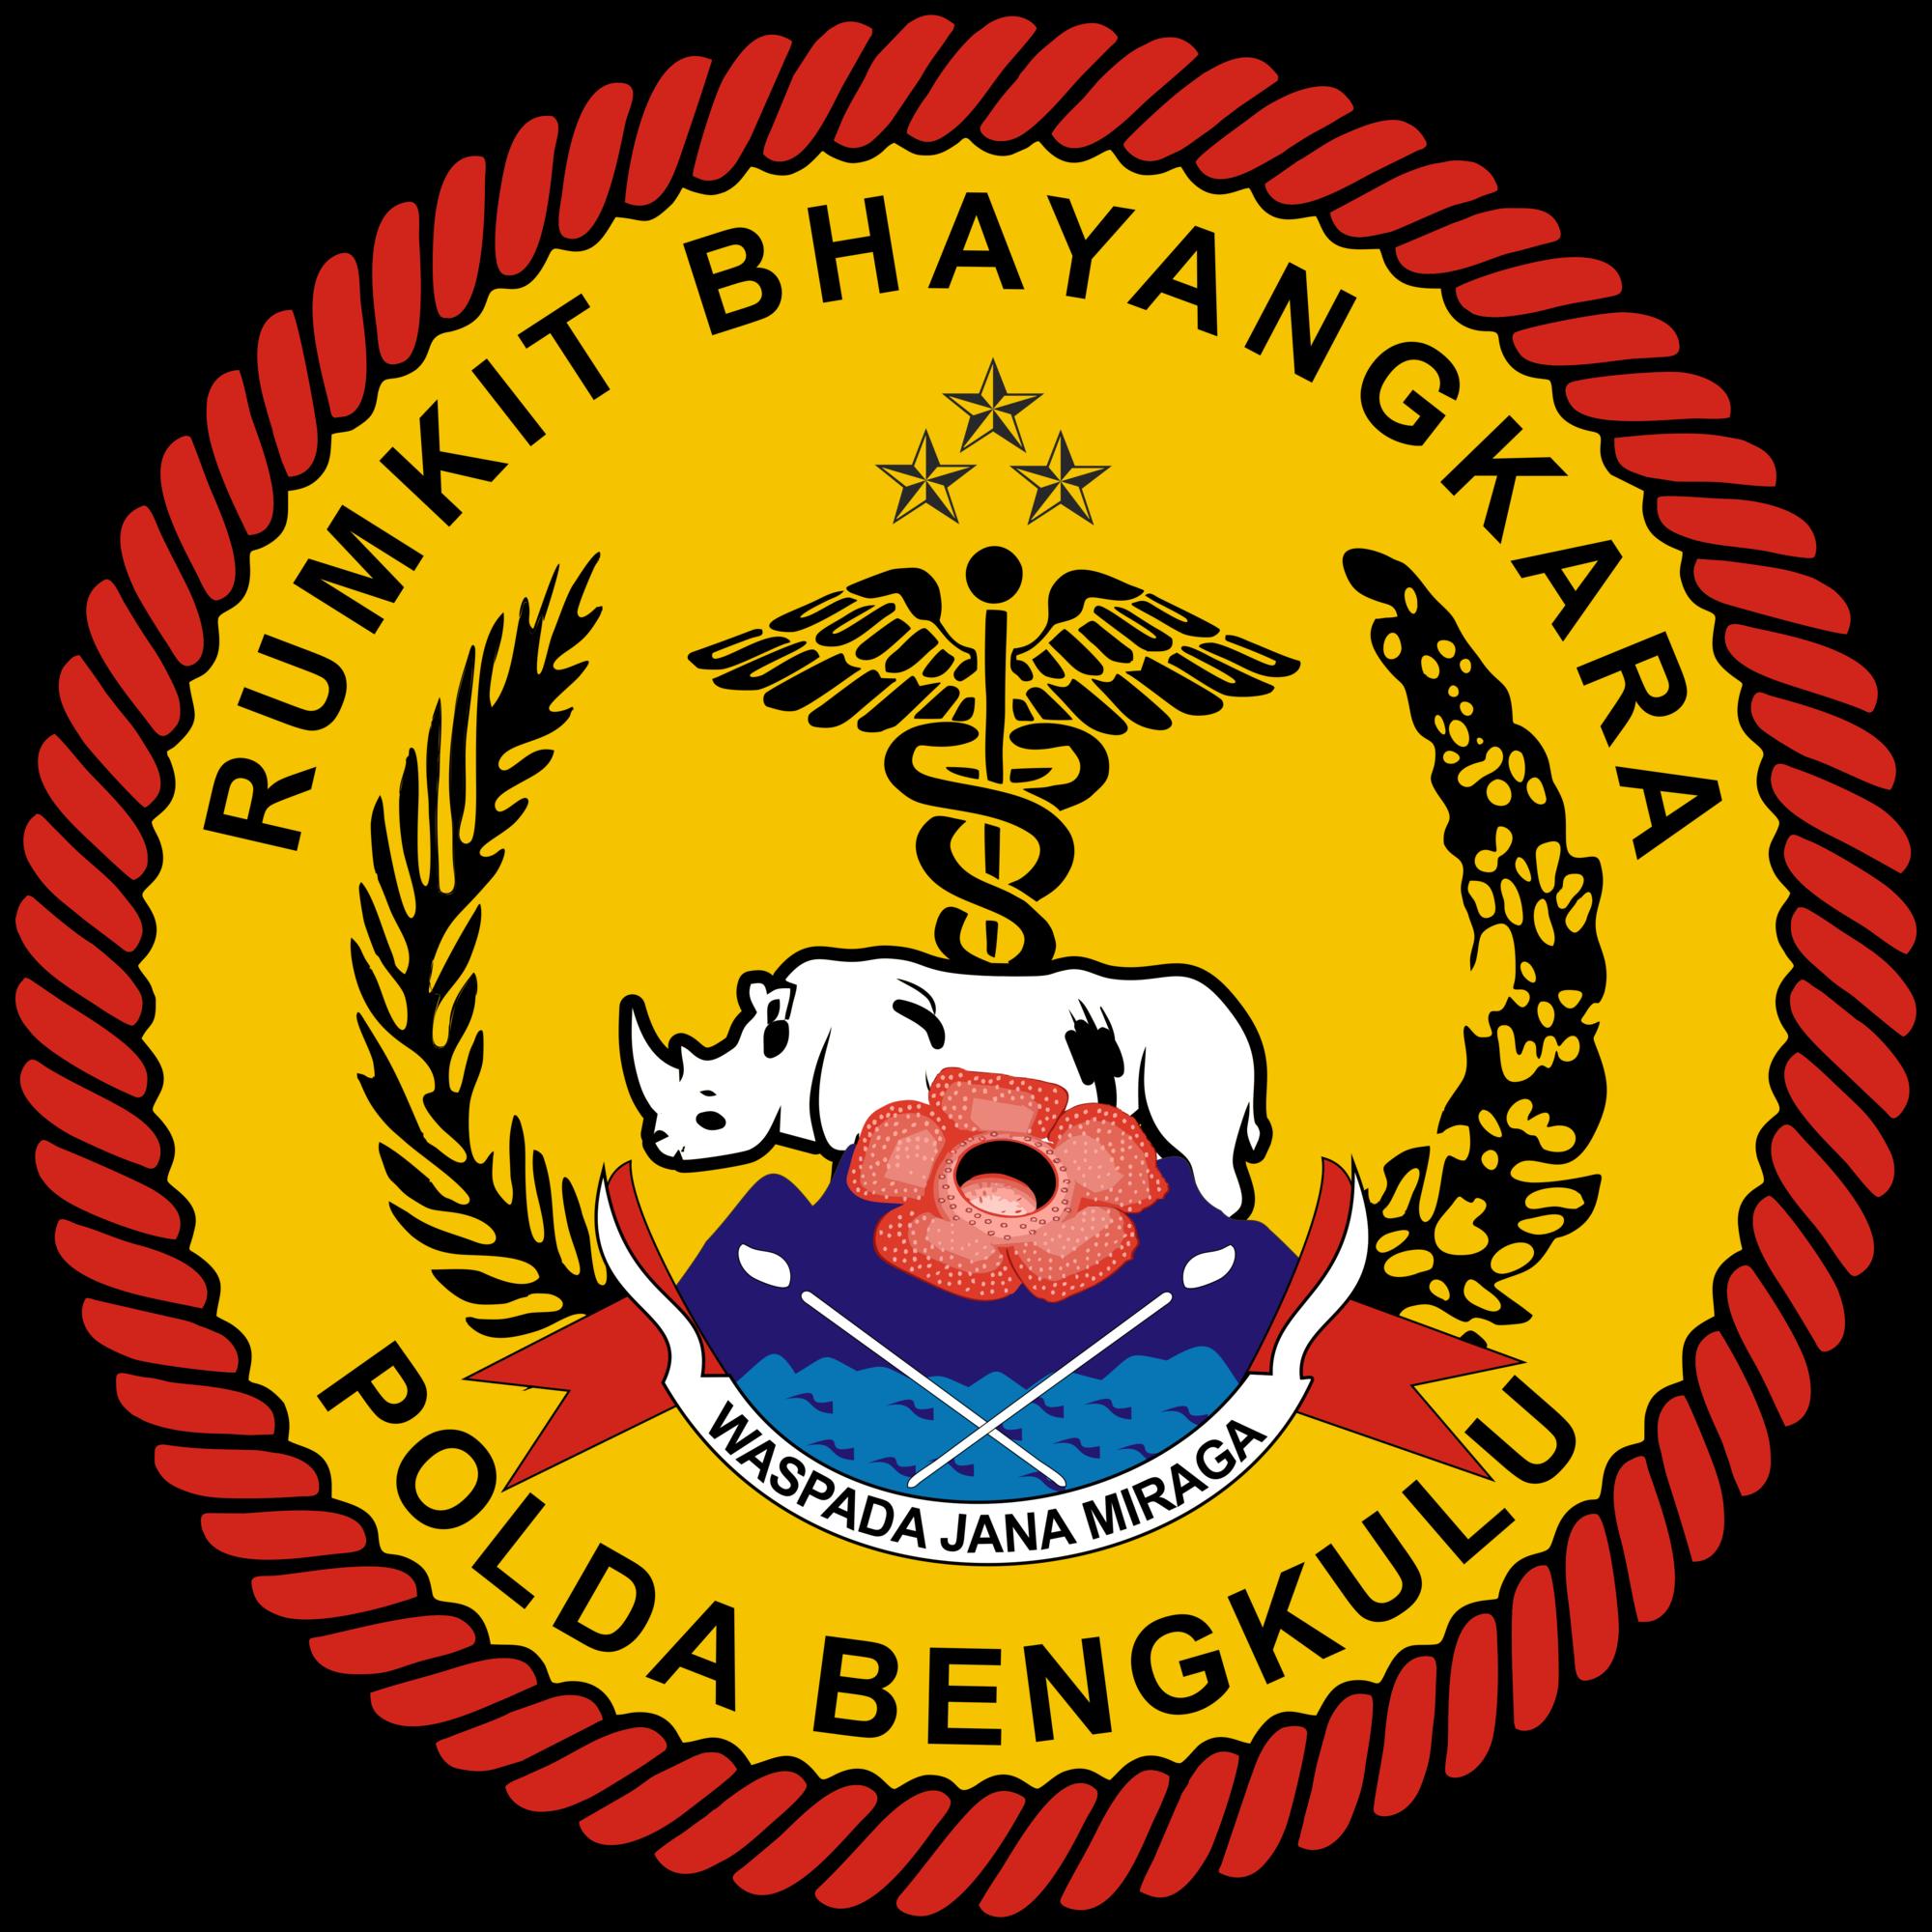 Rumkit Bhayangkara